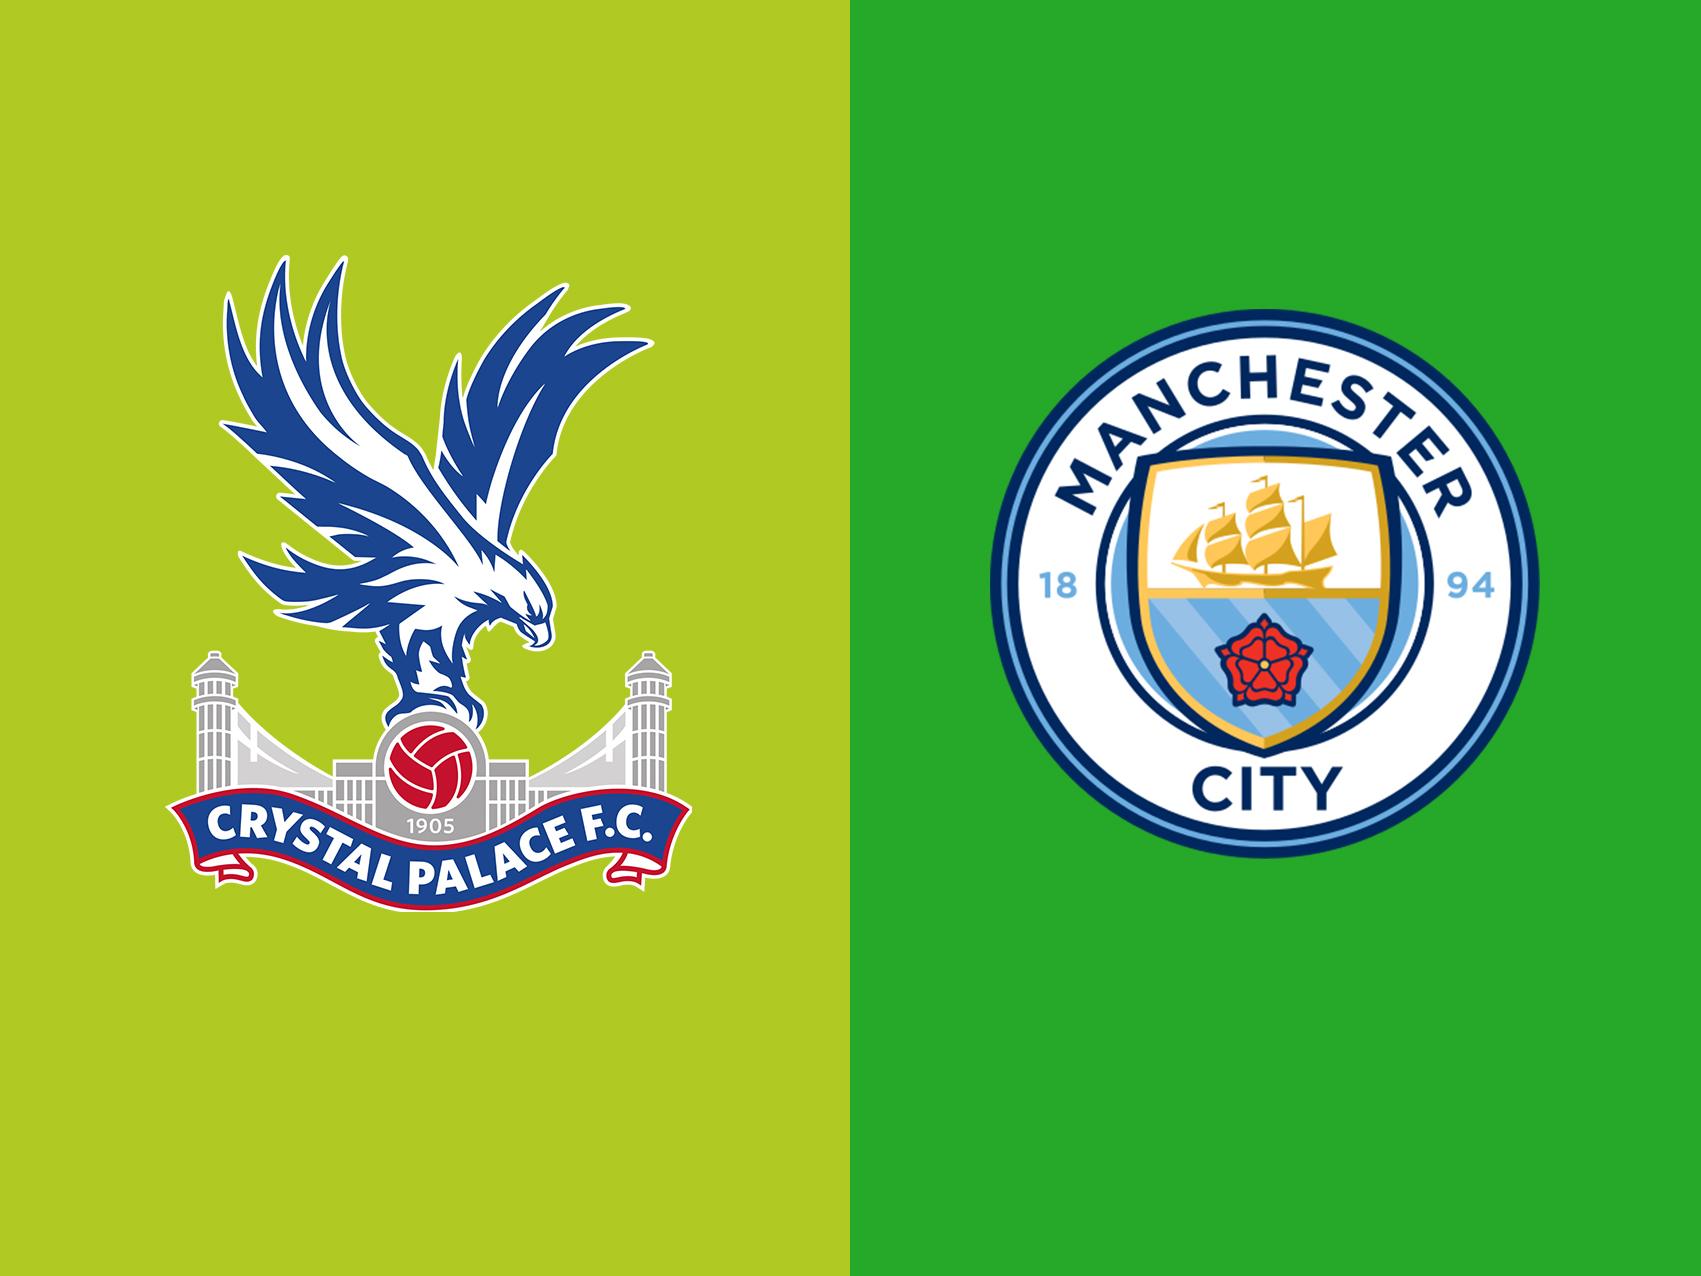 soi-keo-ca-cuoc-bong-da-ngay-14-4-slavia-praha-vs-Manchester City-cong-pha-phao-dai-b9 1